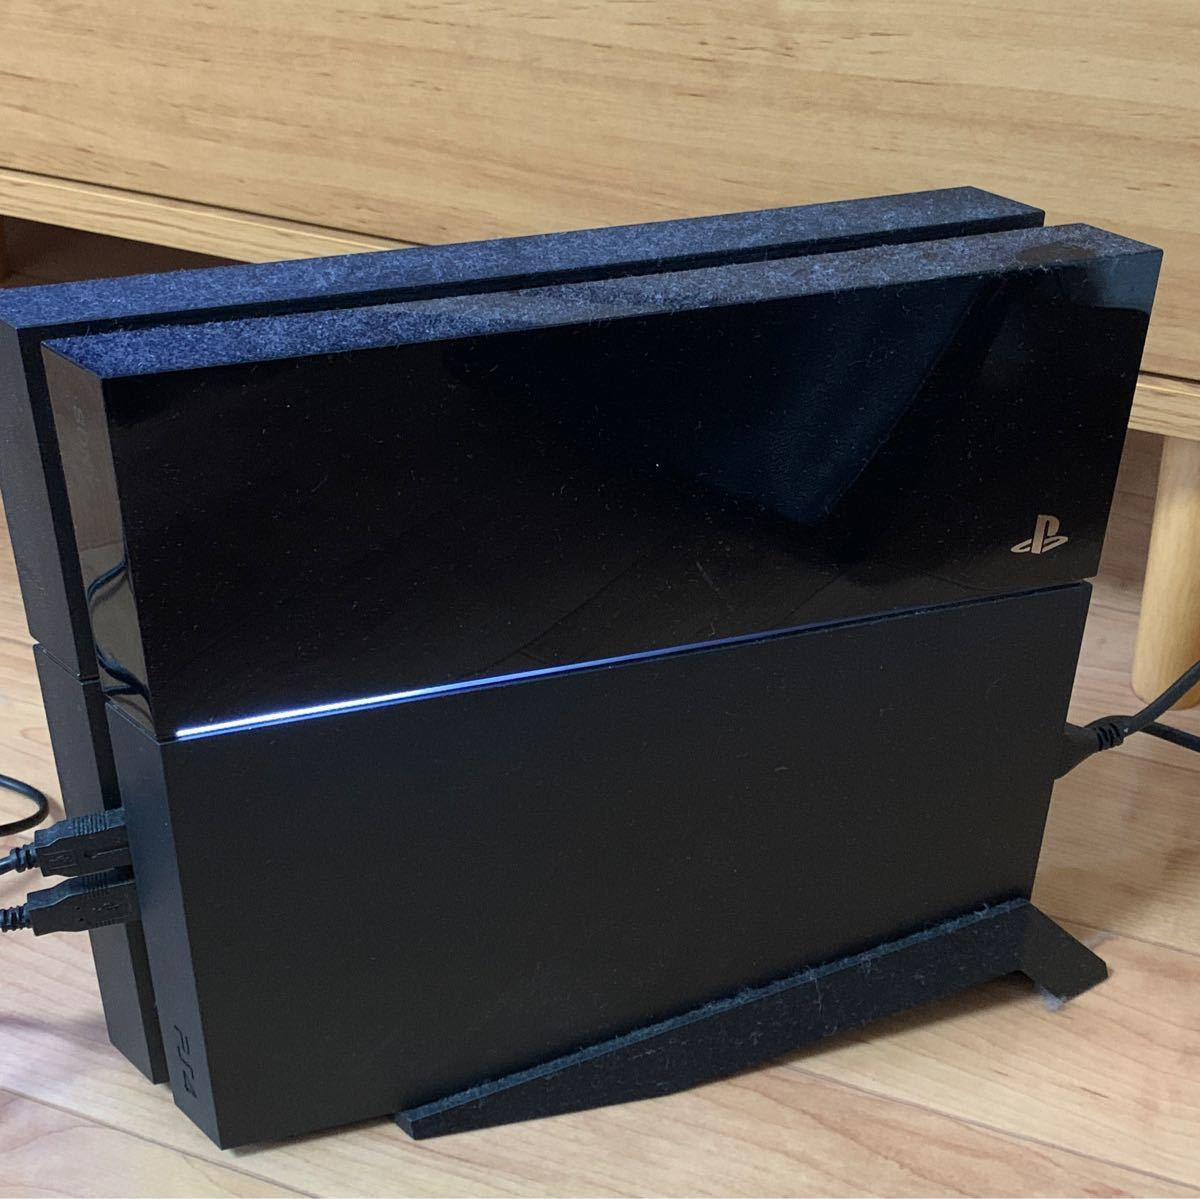 PS4本体 プレステ4 ジェットブラック SONY プレイステーション4 黒本 PlayStation4 ブラック 封印シール